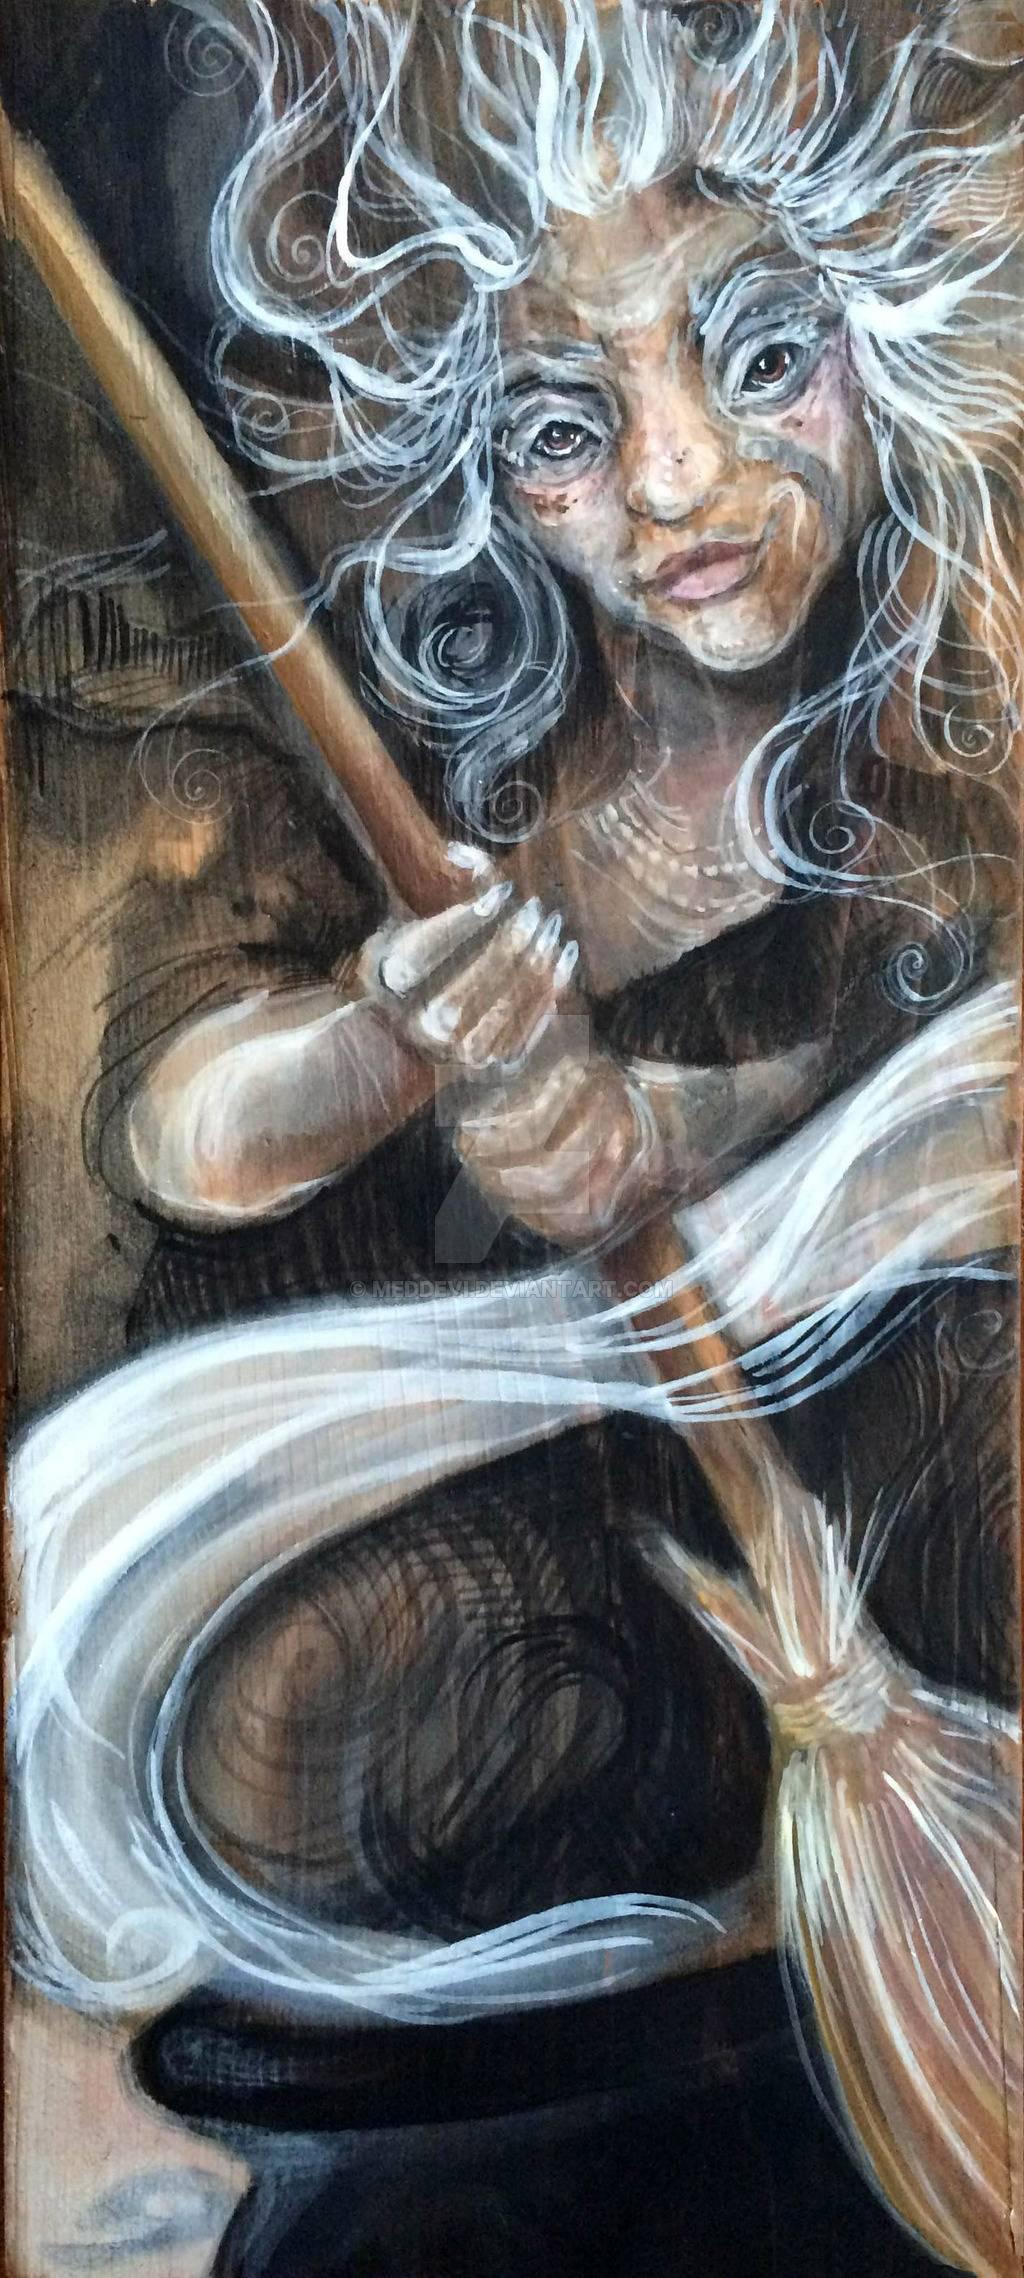 Баба яга в древней руси. баба яга в славянской мифологии — от богини к старушке